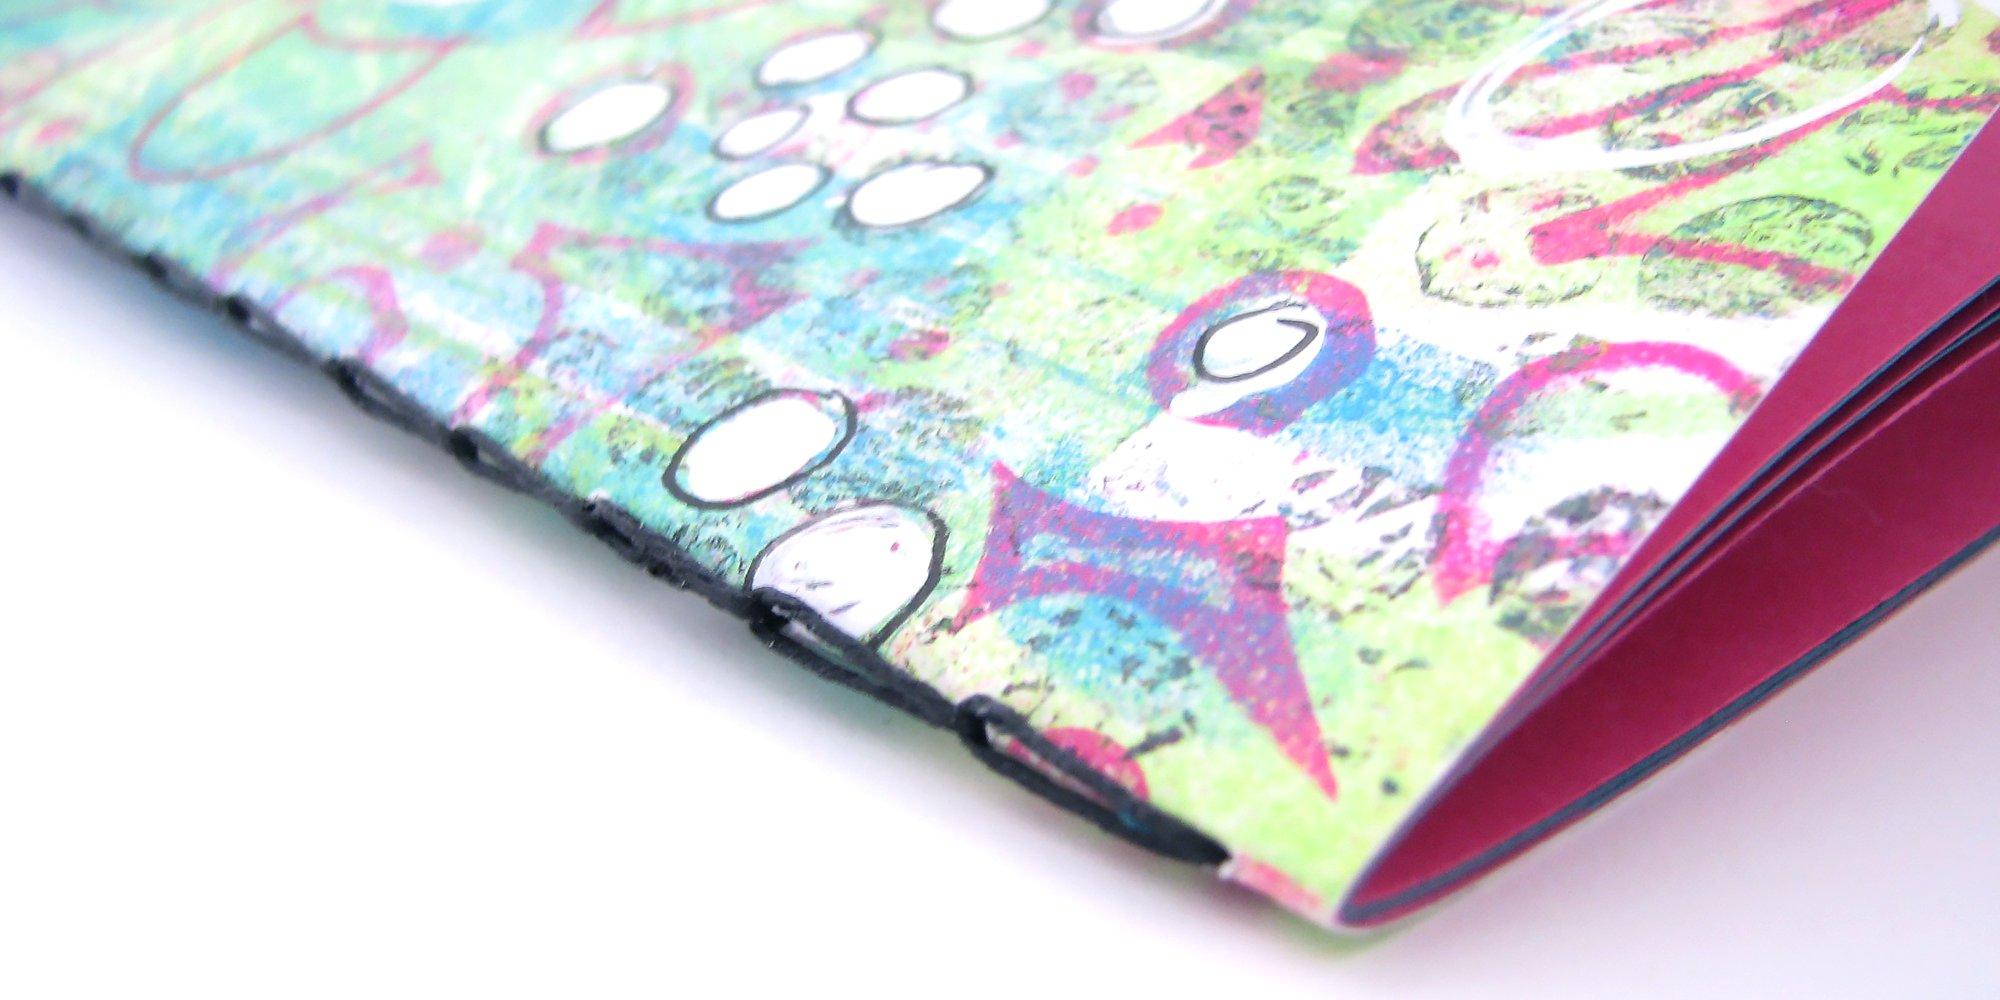 Chain Stitch notebook